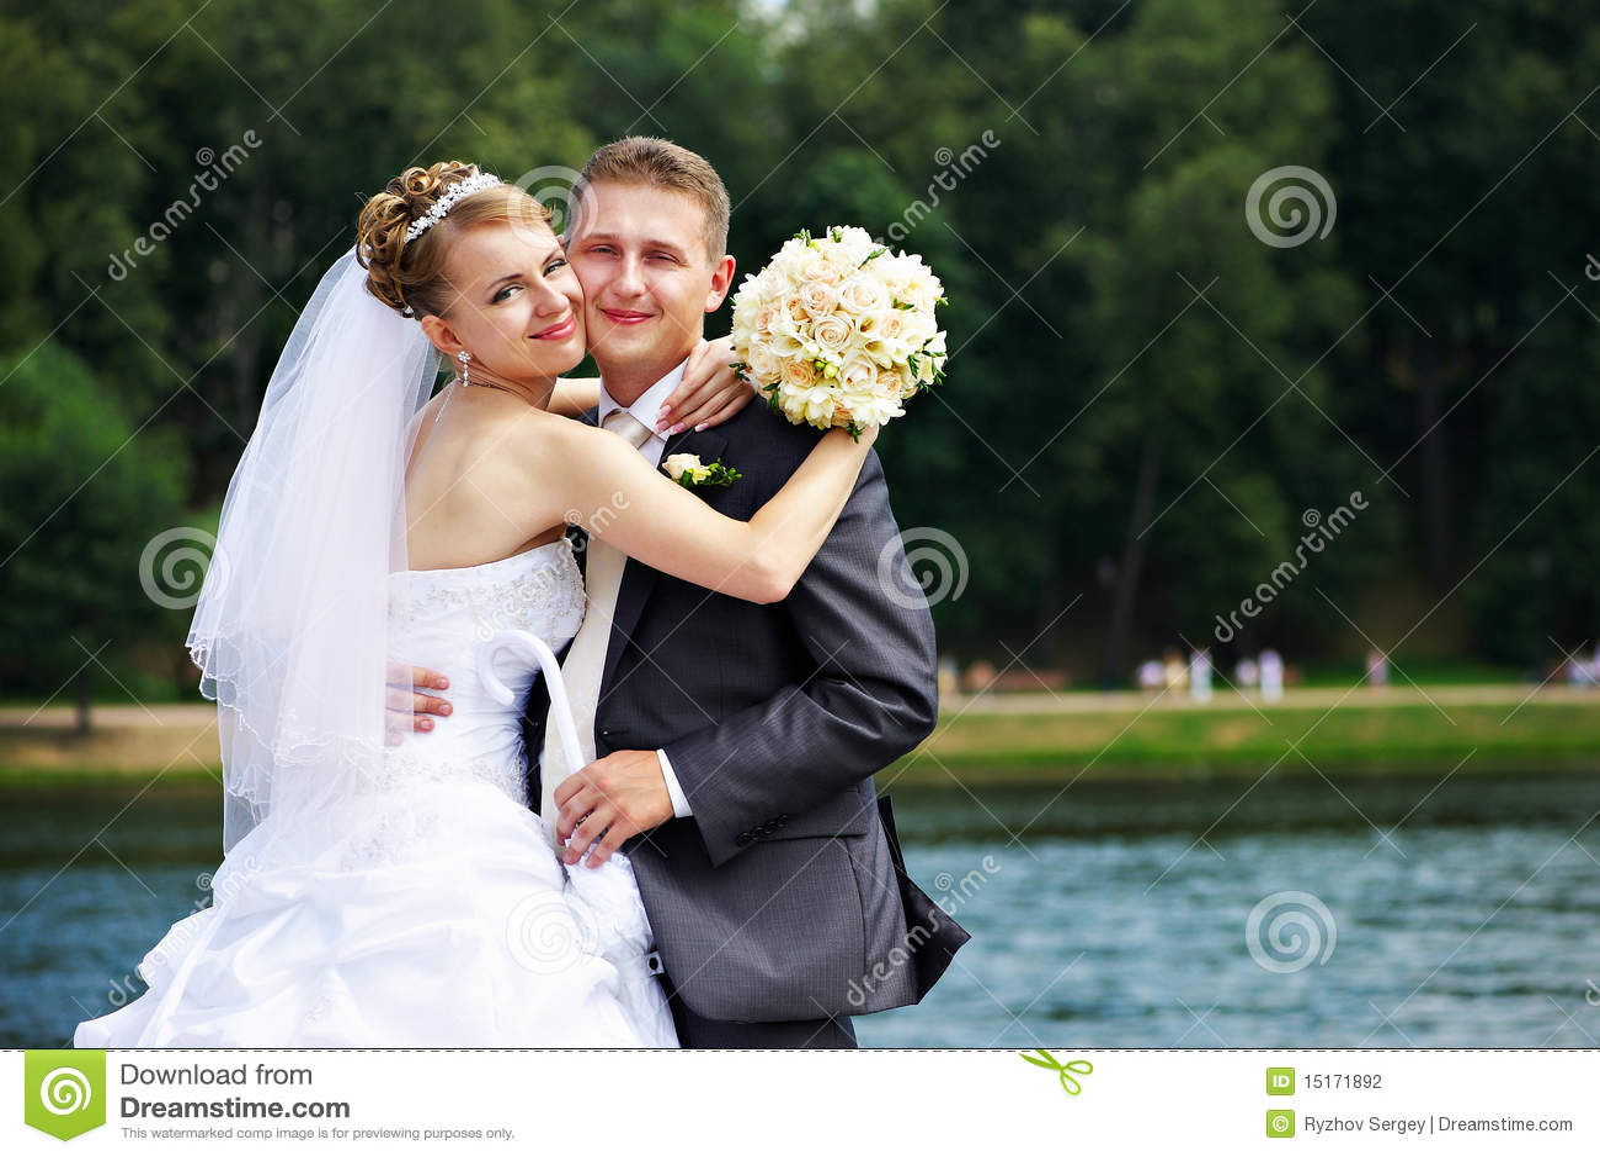 Romantic Couples At Wedding Walk